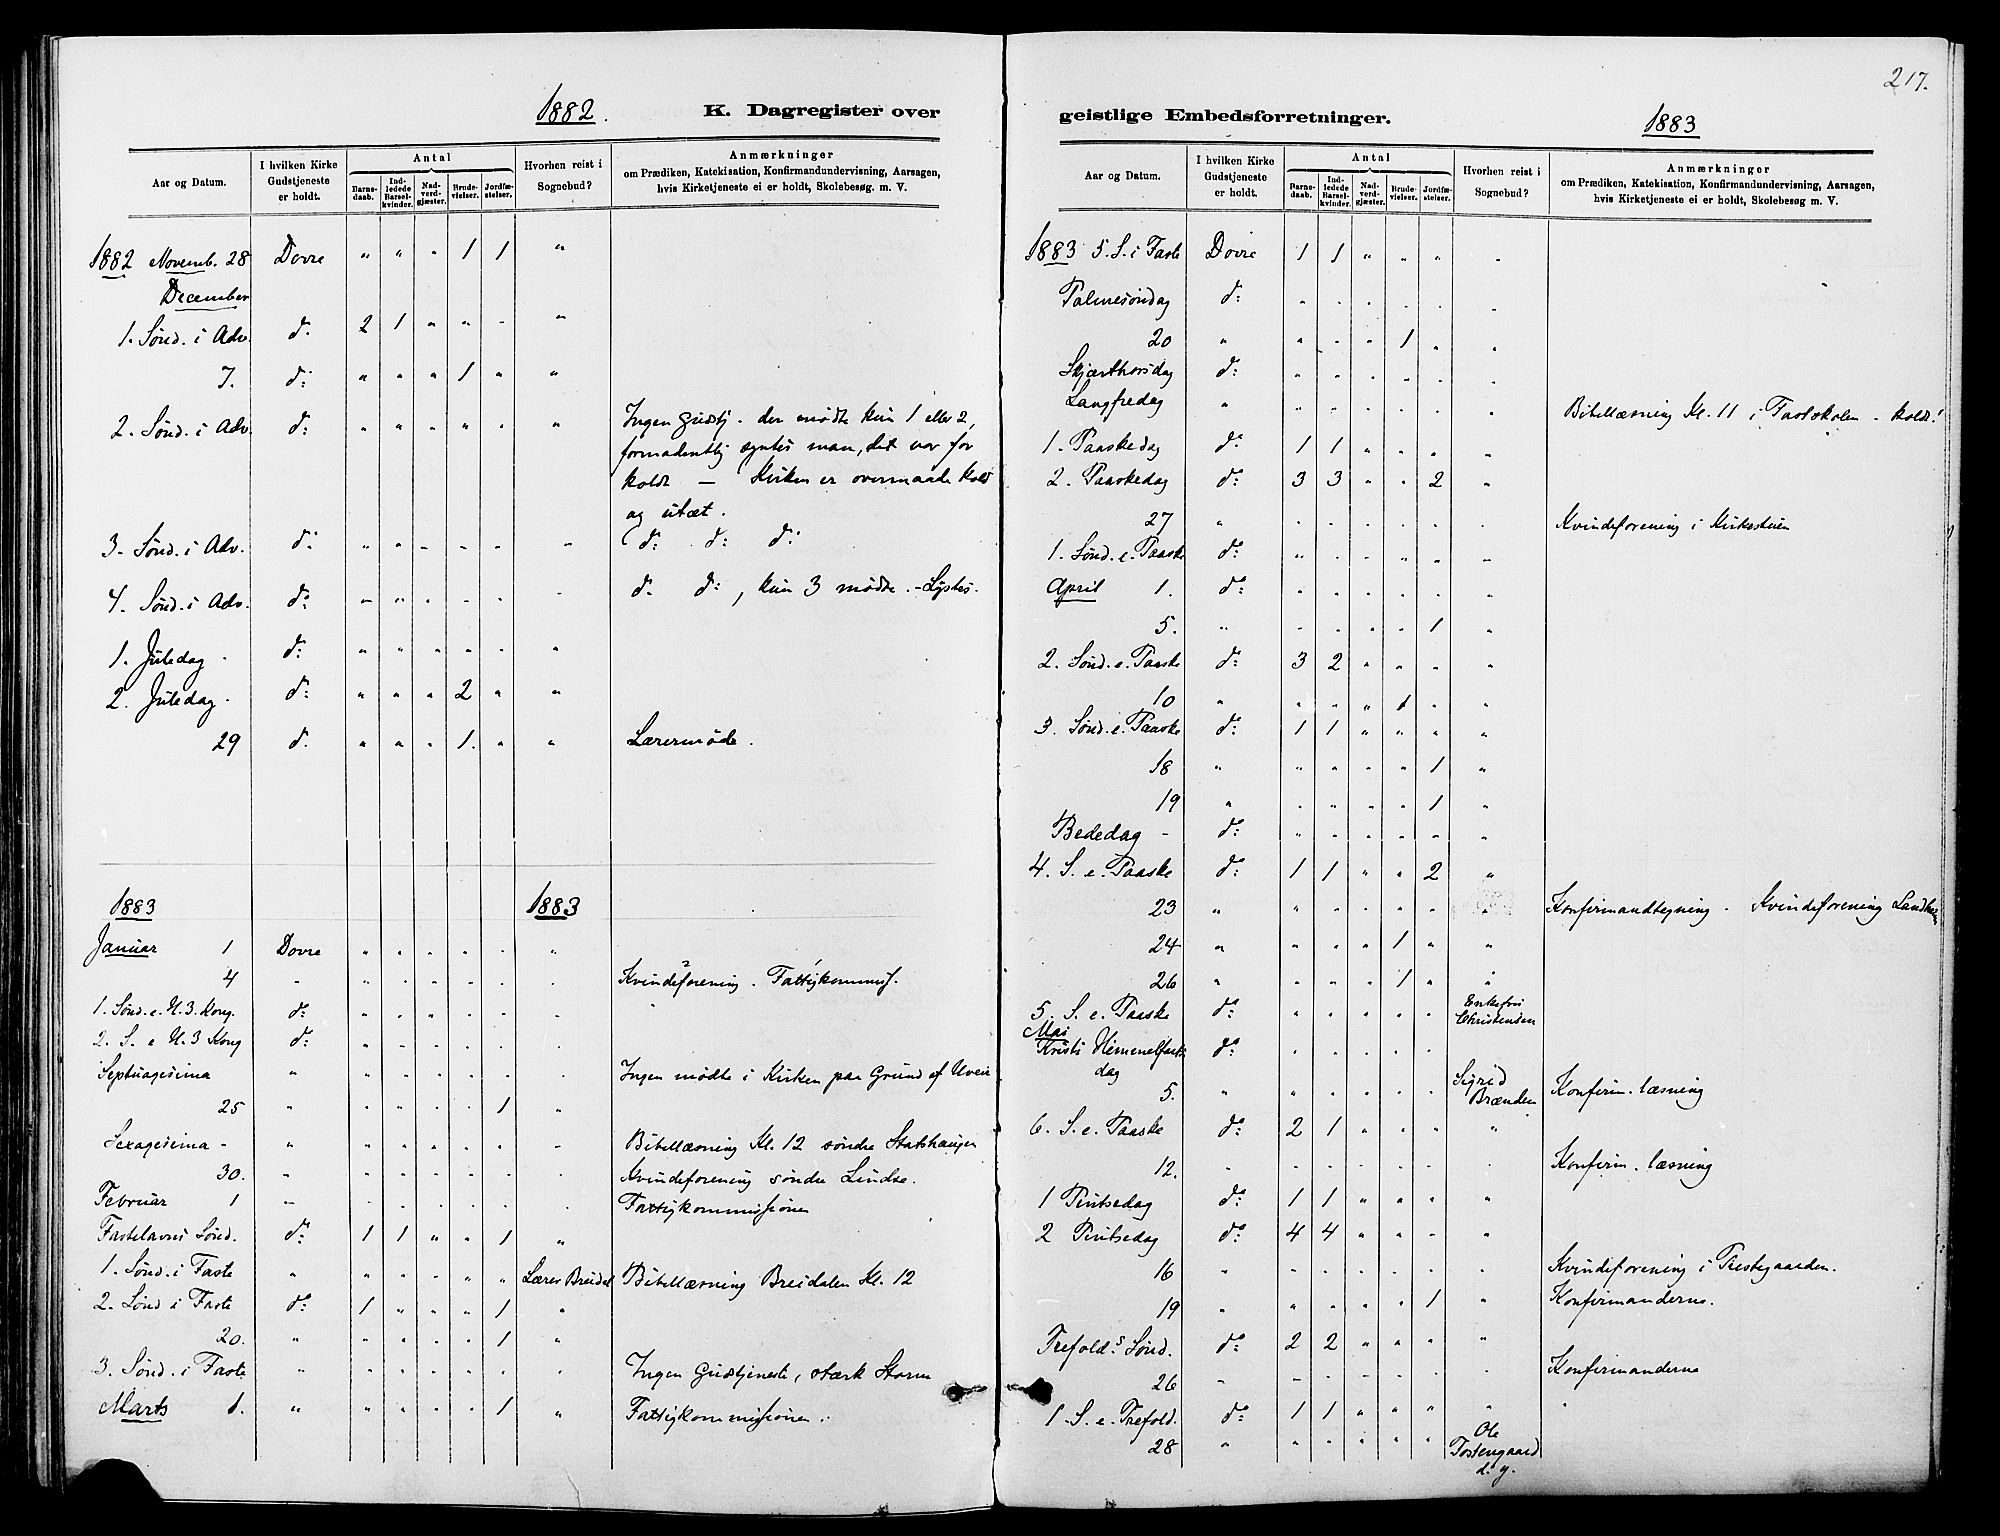 SAH, Dovre prestekontor, Ministerialbok nr. 2, 1879-1890, s. 217